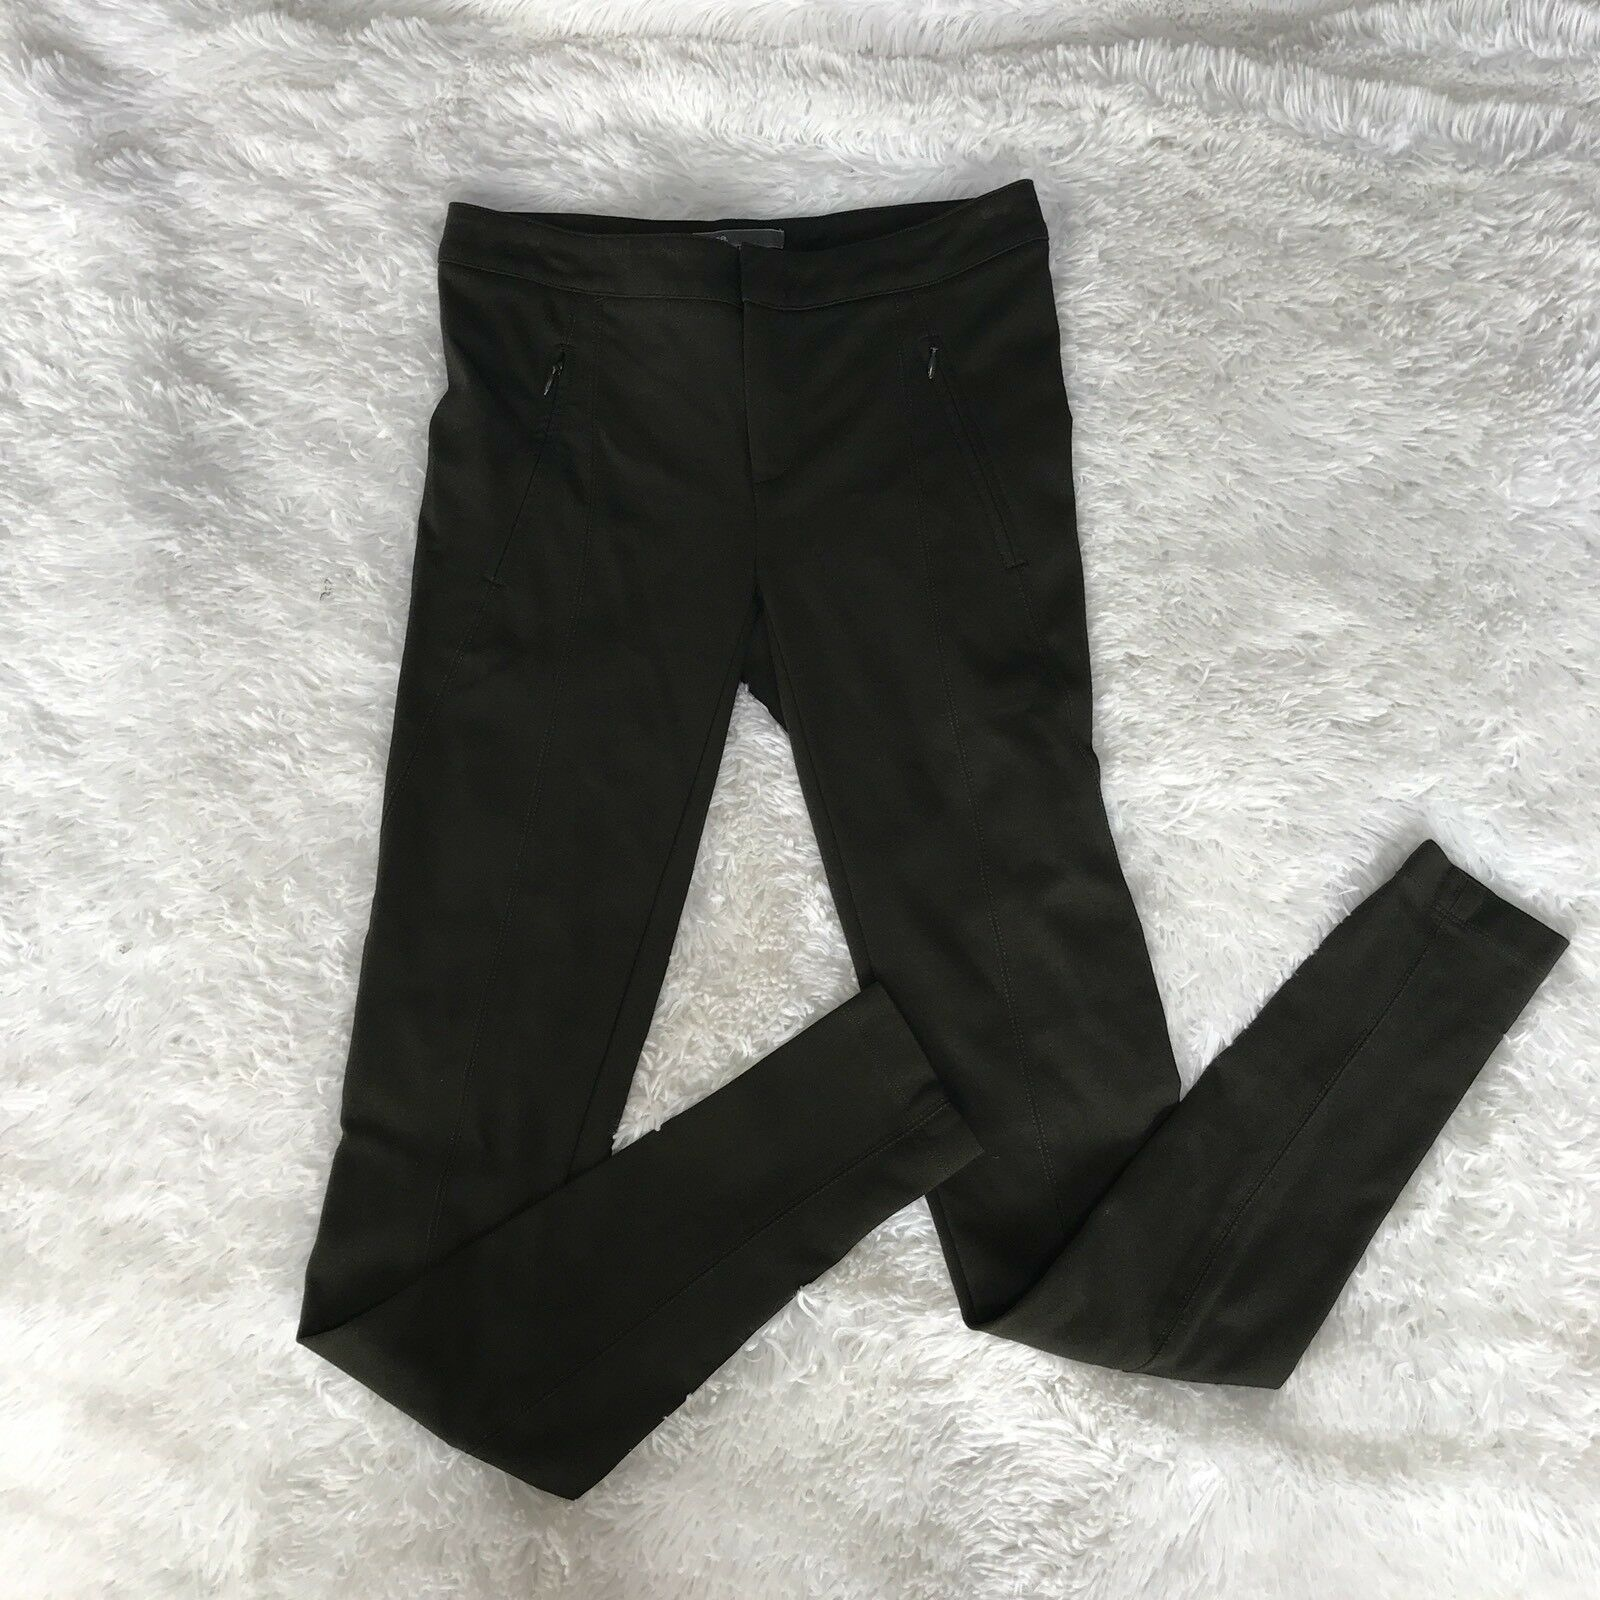 Preowned Vince Woman Skinny Pants Leggins SZ 2 color Khaki